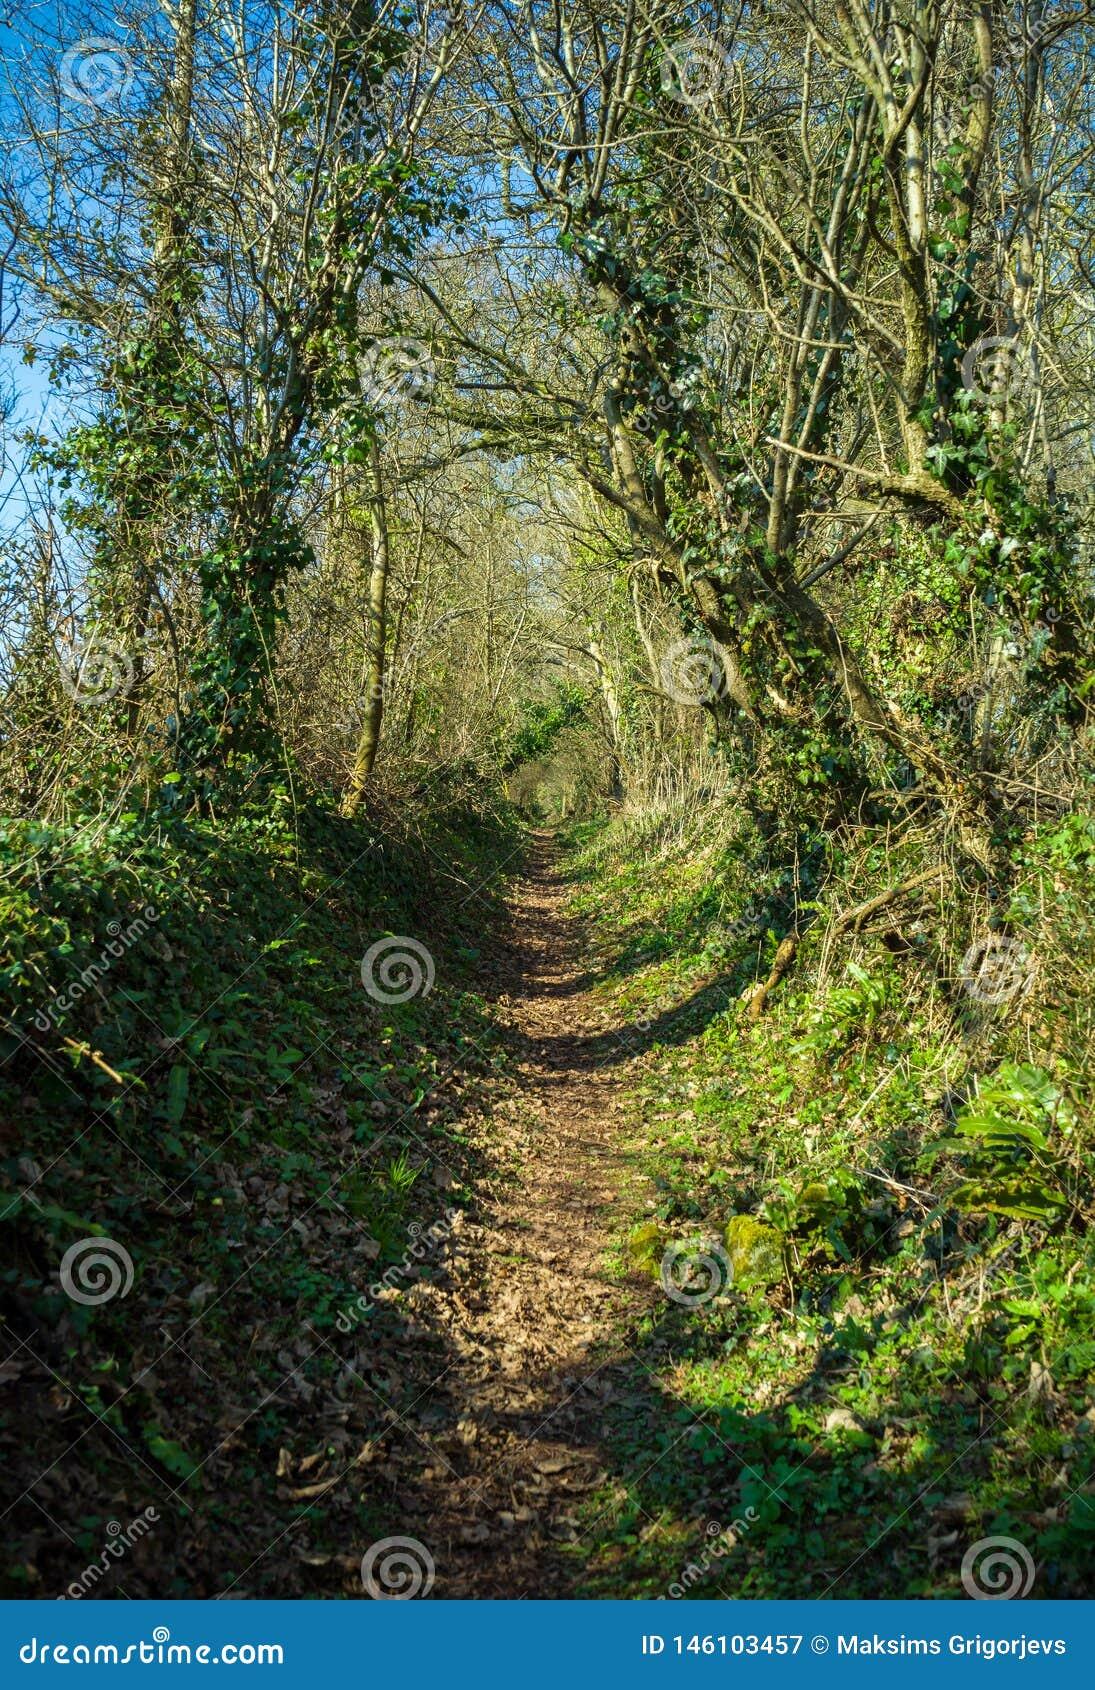 Footpath through typical British English woodland in spring